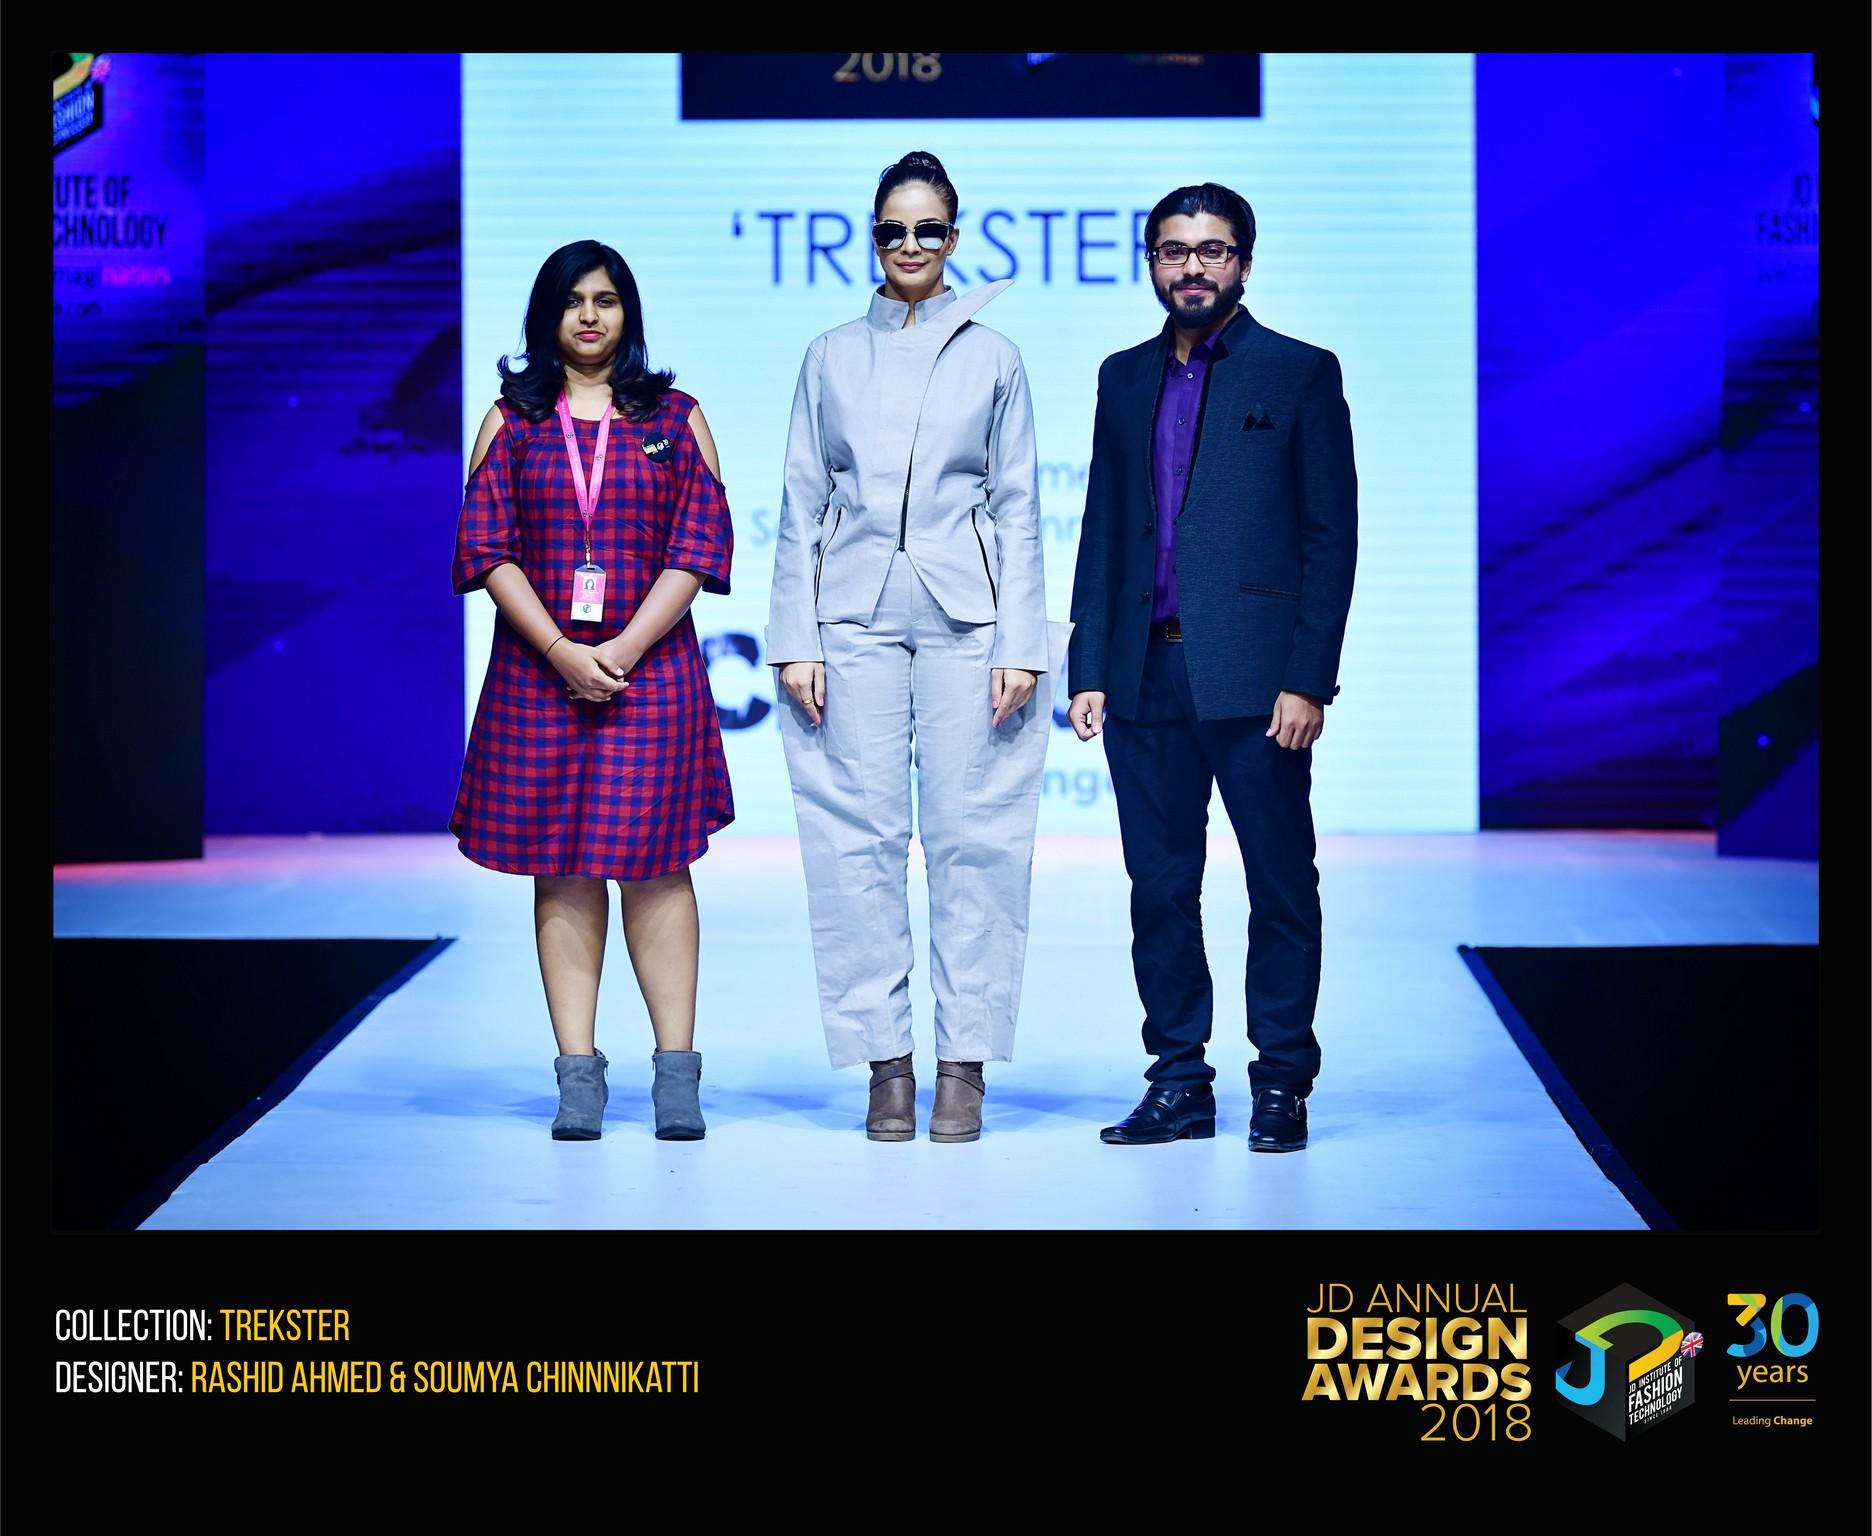 Trekster – Change – JD Annual Design Awards 2018 | Designer: Rashid and Soumya | Photography : Jerin Nath (@jerin_nath) trekster - TREKSTER 8 - Trekster – Change – JD Annual Design Awards 2018